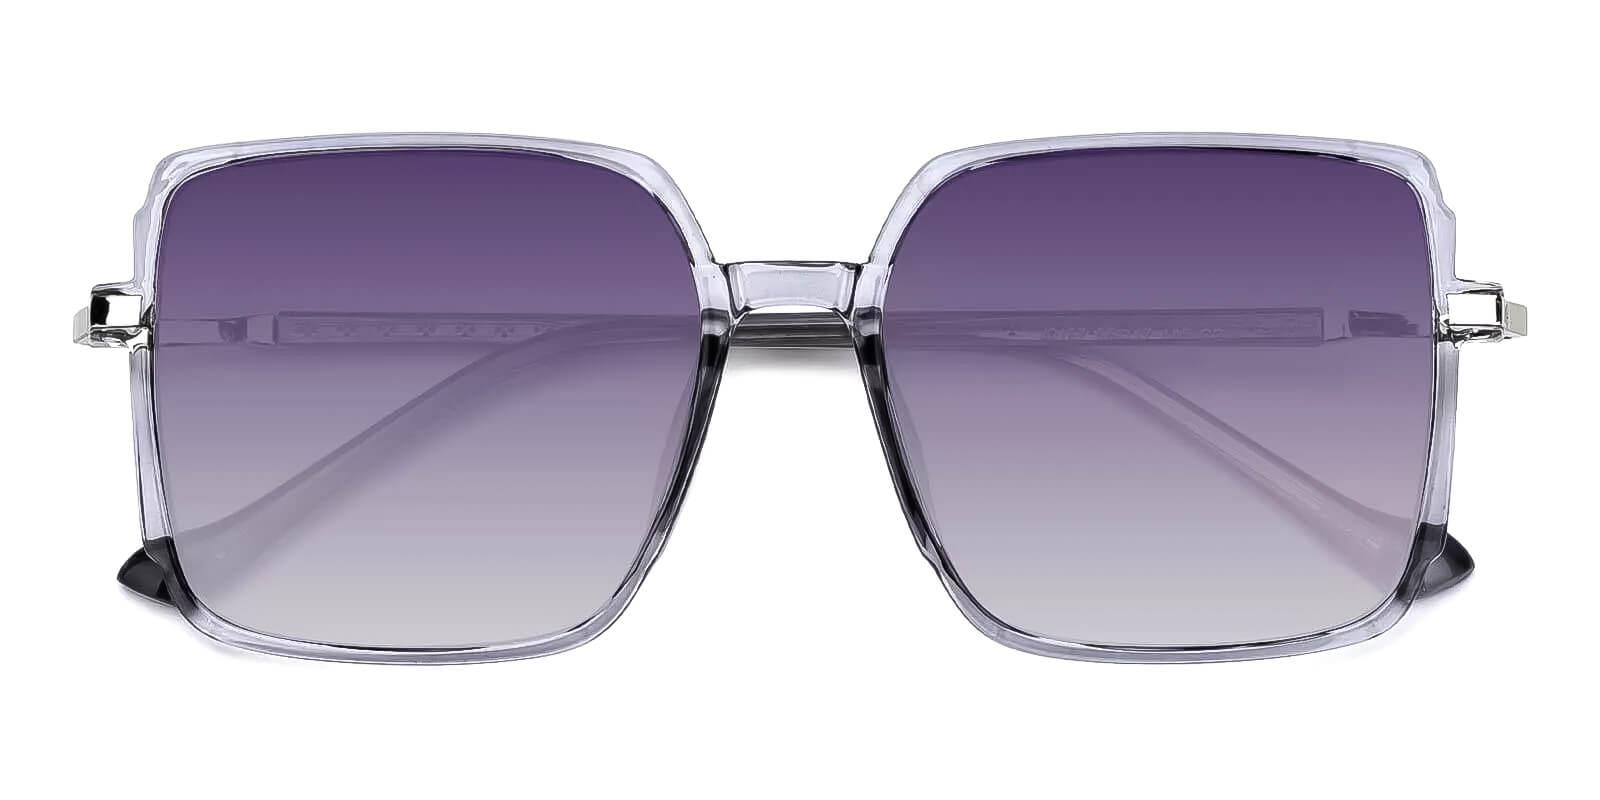 Quest Gray TR Fashion , Sunglasses , UniversalBridgeFit Frames from ABBE Glasses